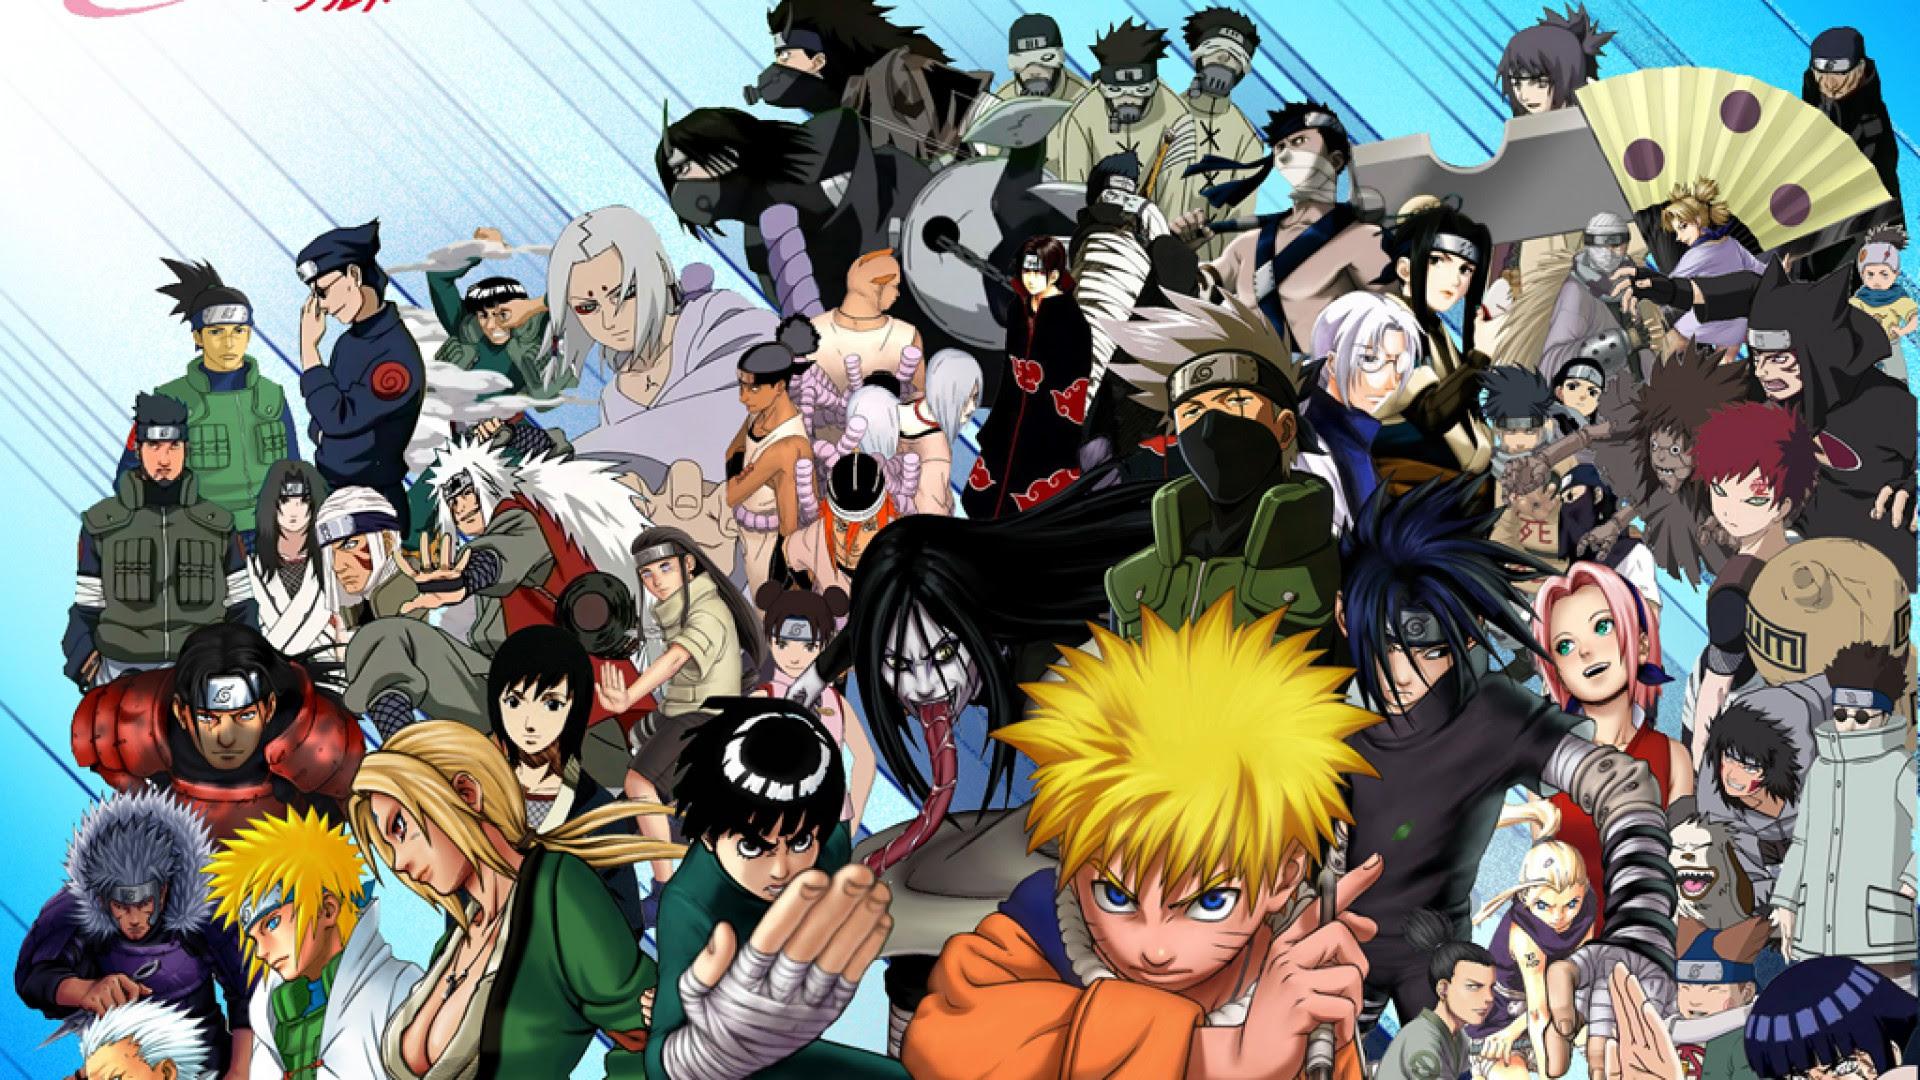 Unduh 81 Wallpaper Naruto Hd Landscape Gratis